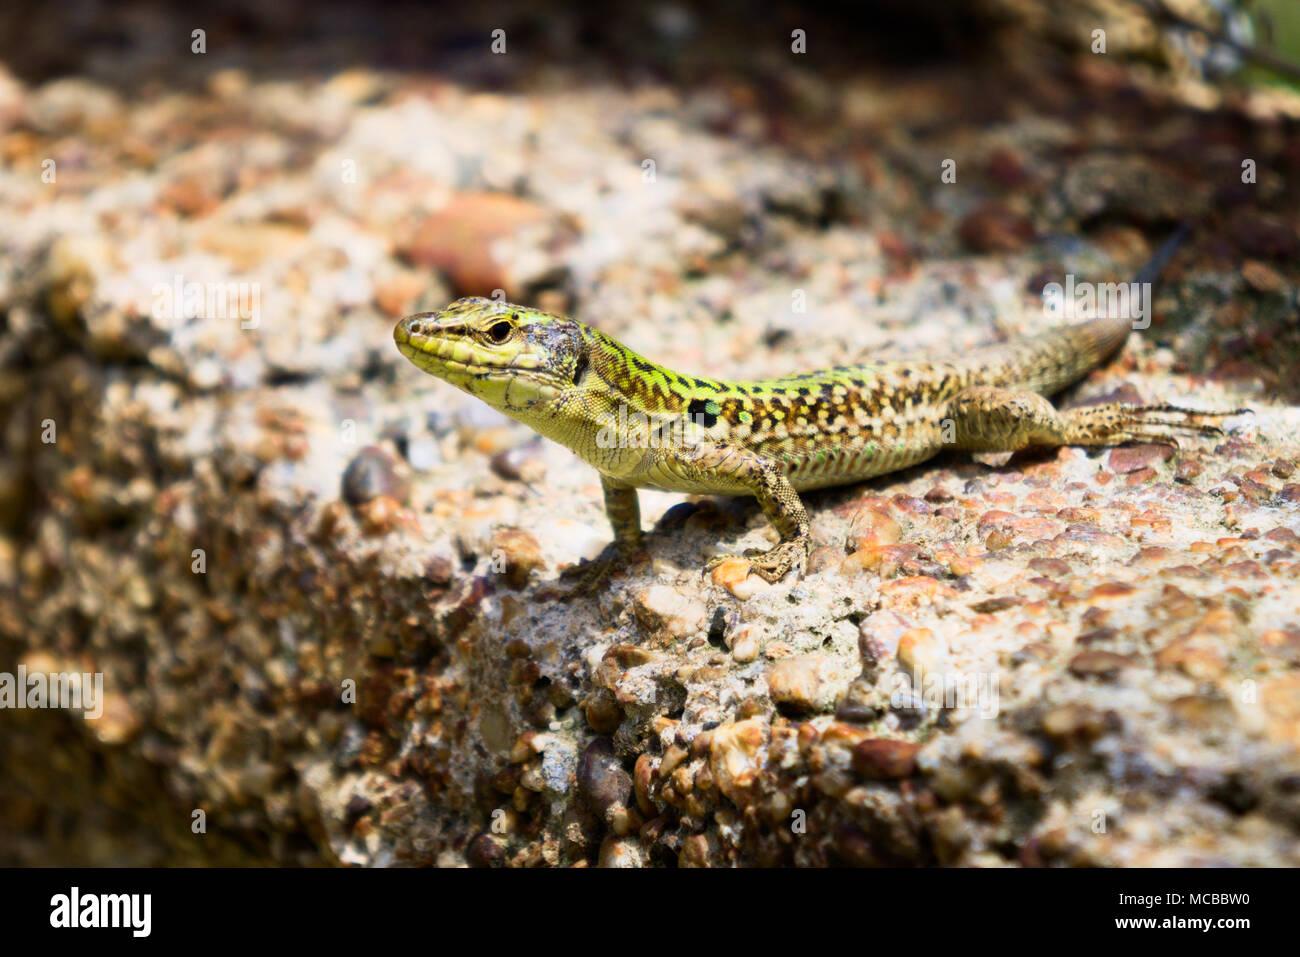 Rural Lizard, Podarcis siculus in Sunlight. - Stock Image